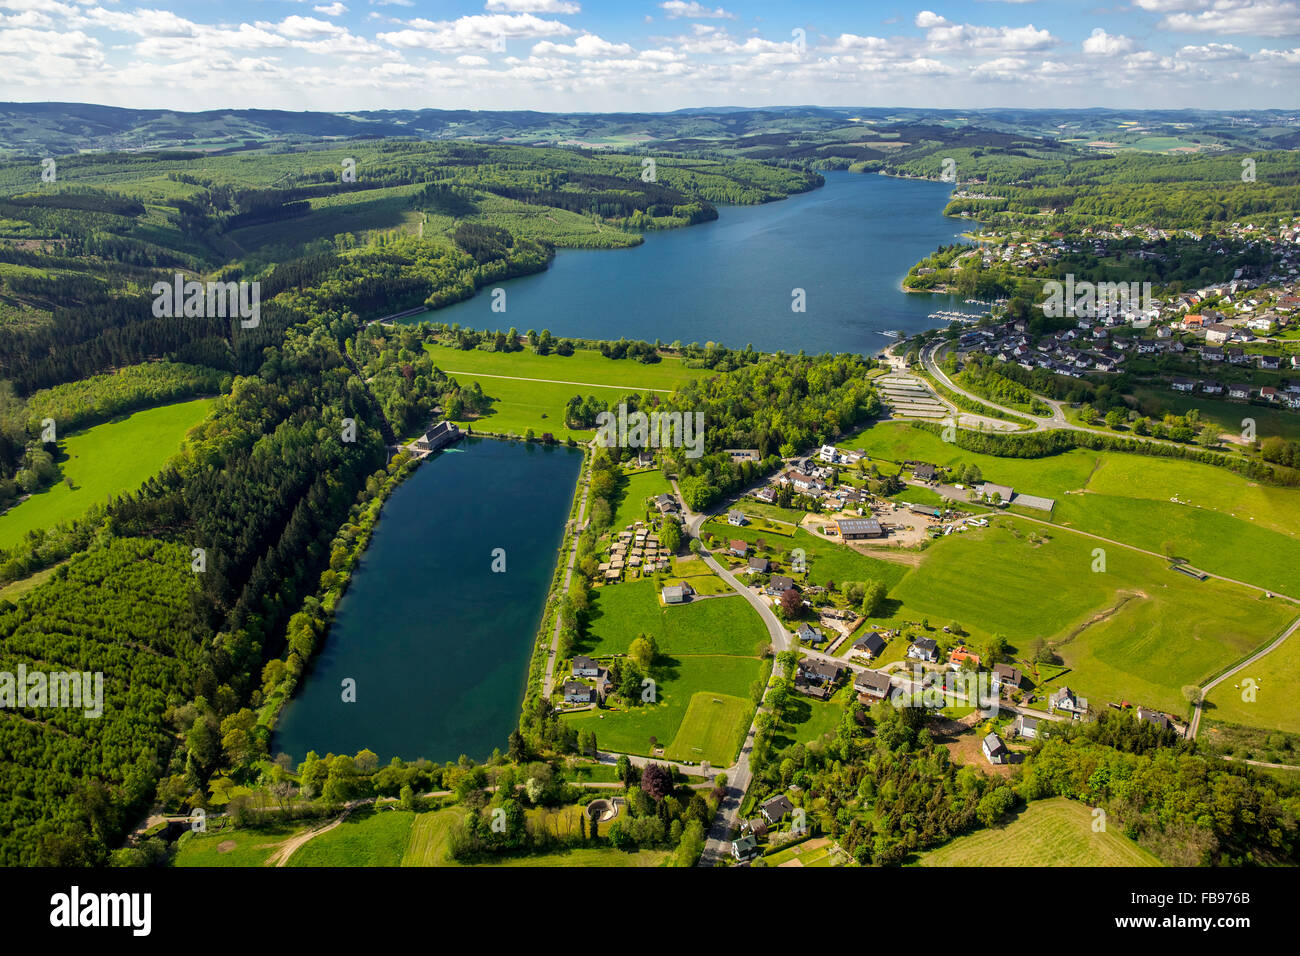 Aerial view, Sorpesee settled Weiher, Sundern, Sauerland, North Rhine-Westphalia, Germany, Europe, Aerial view, Stock Photo